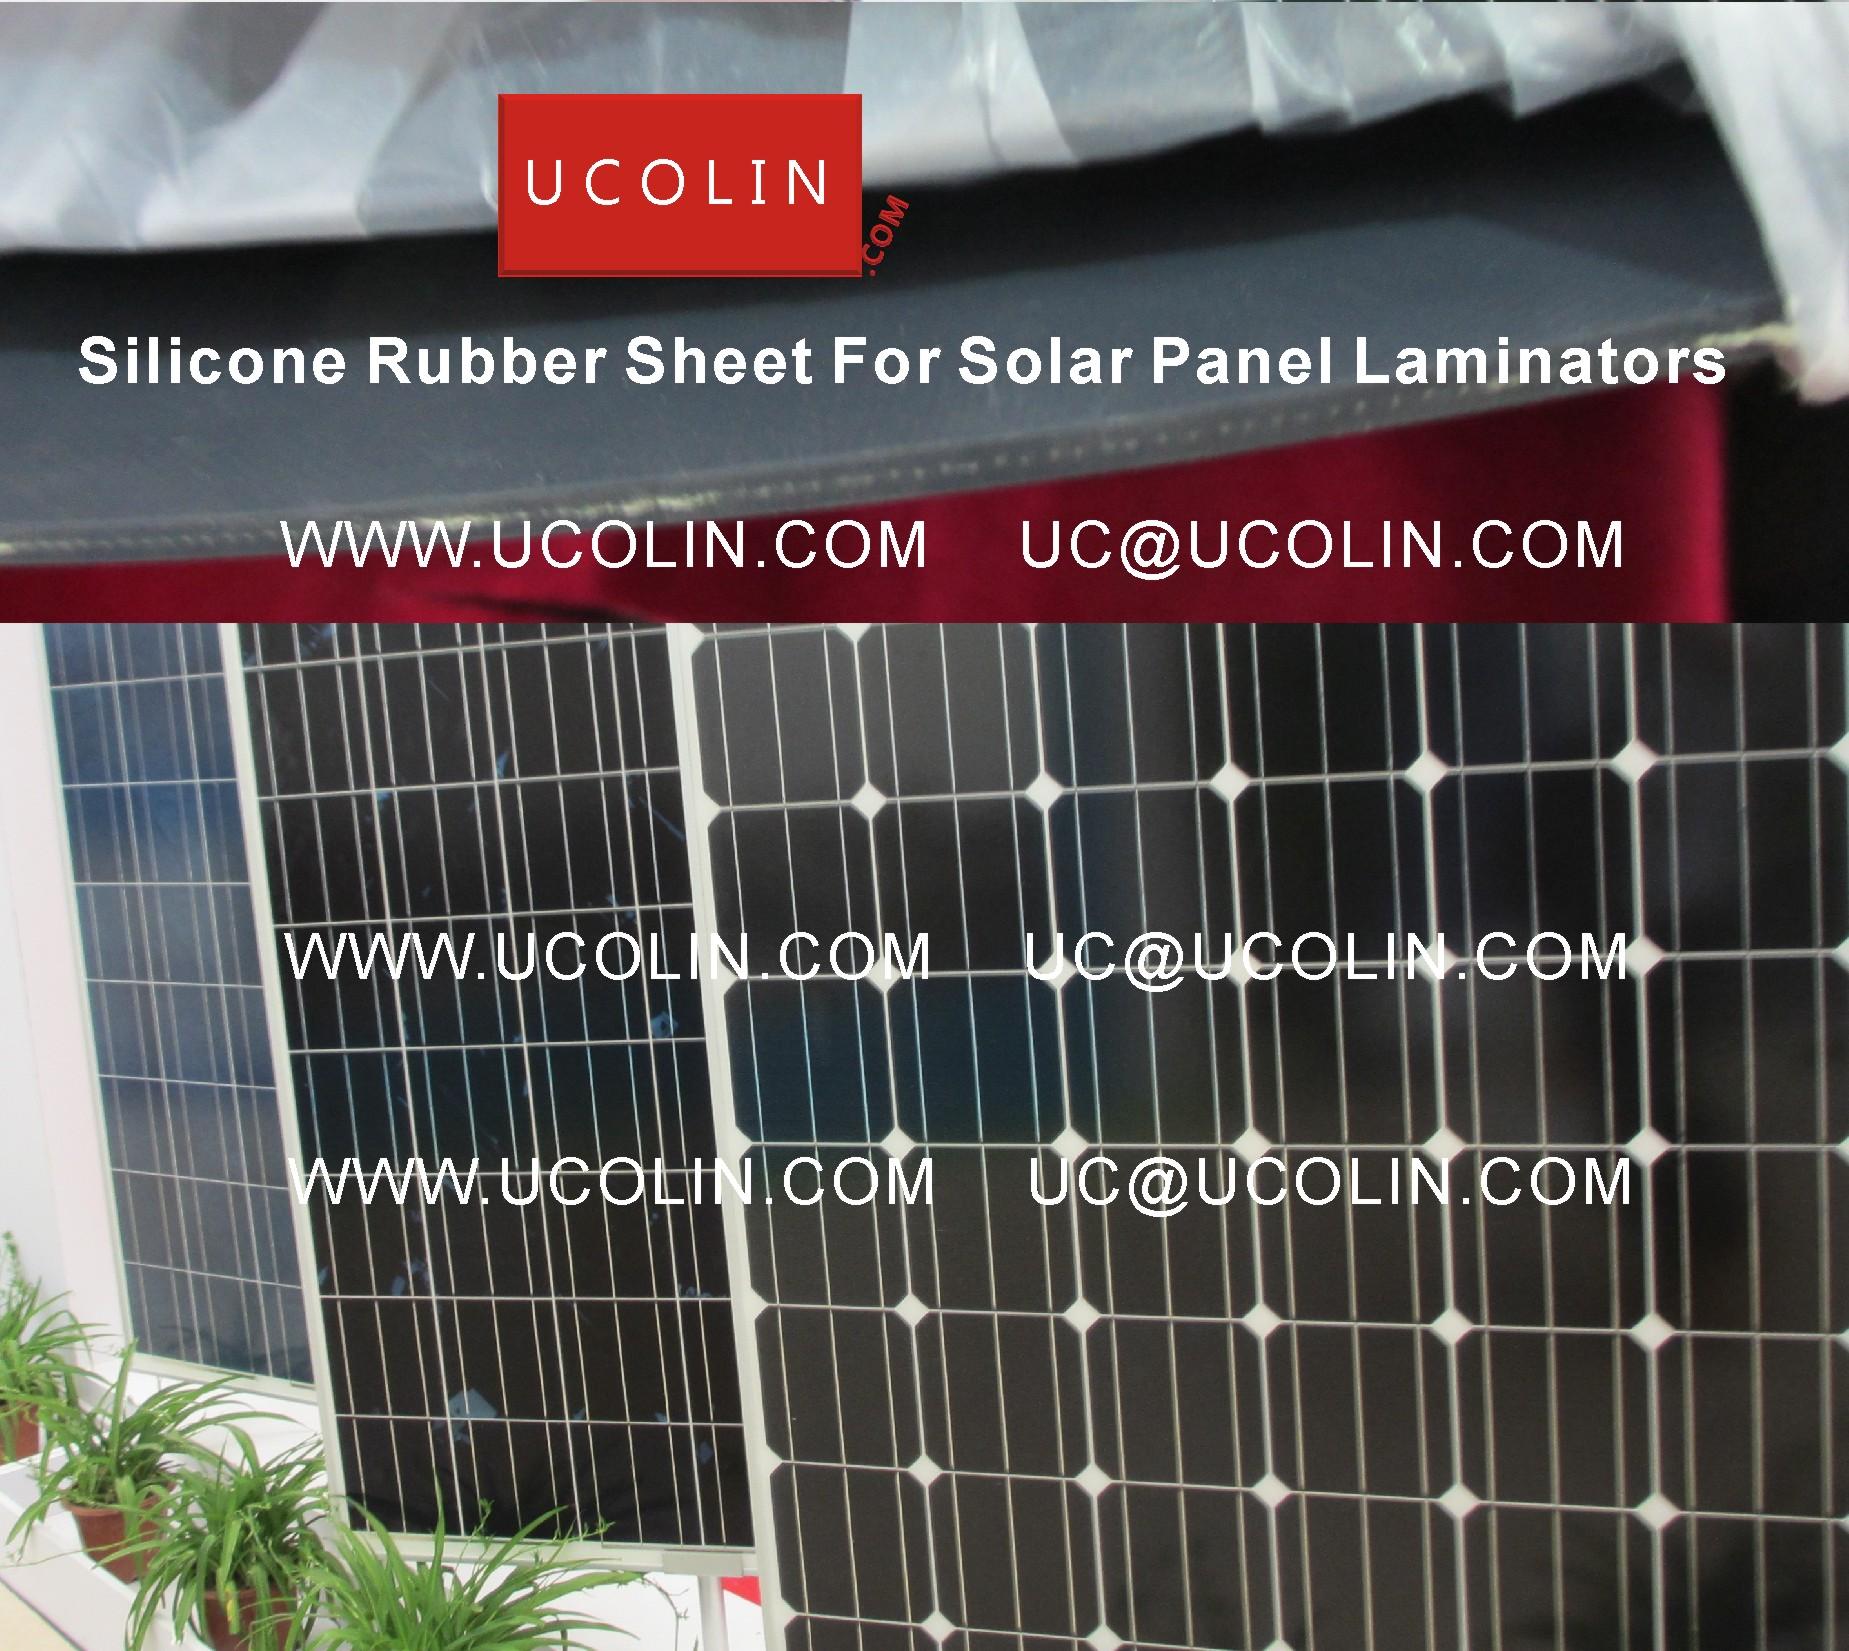 002 Silicon Rubber Sheet For Solar Panel Laminators